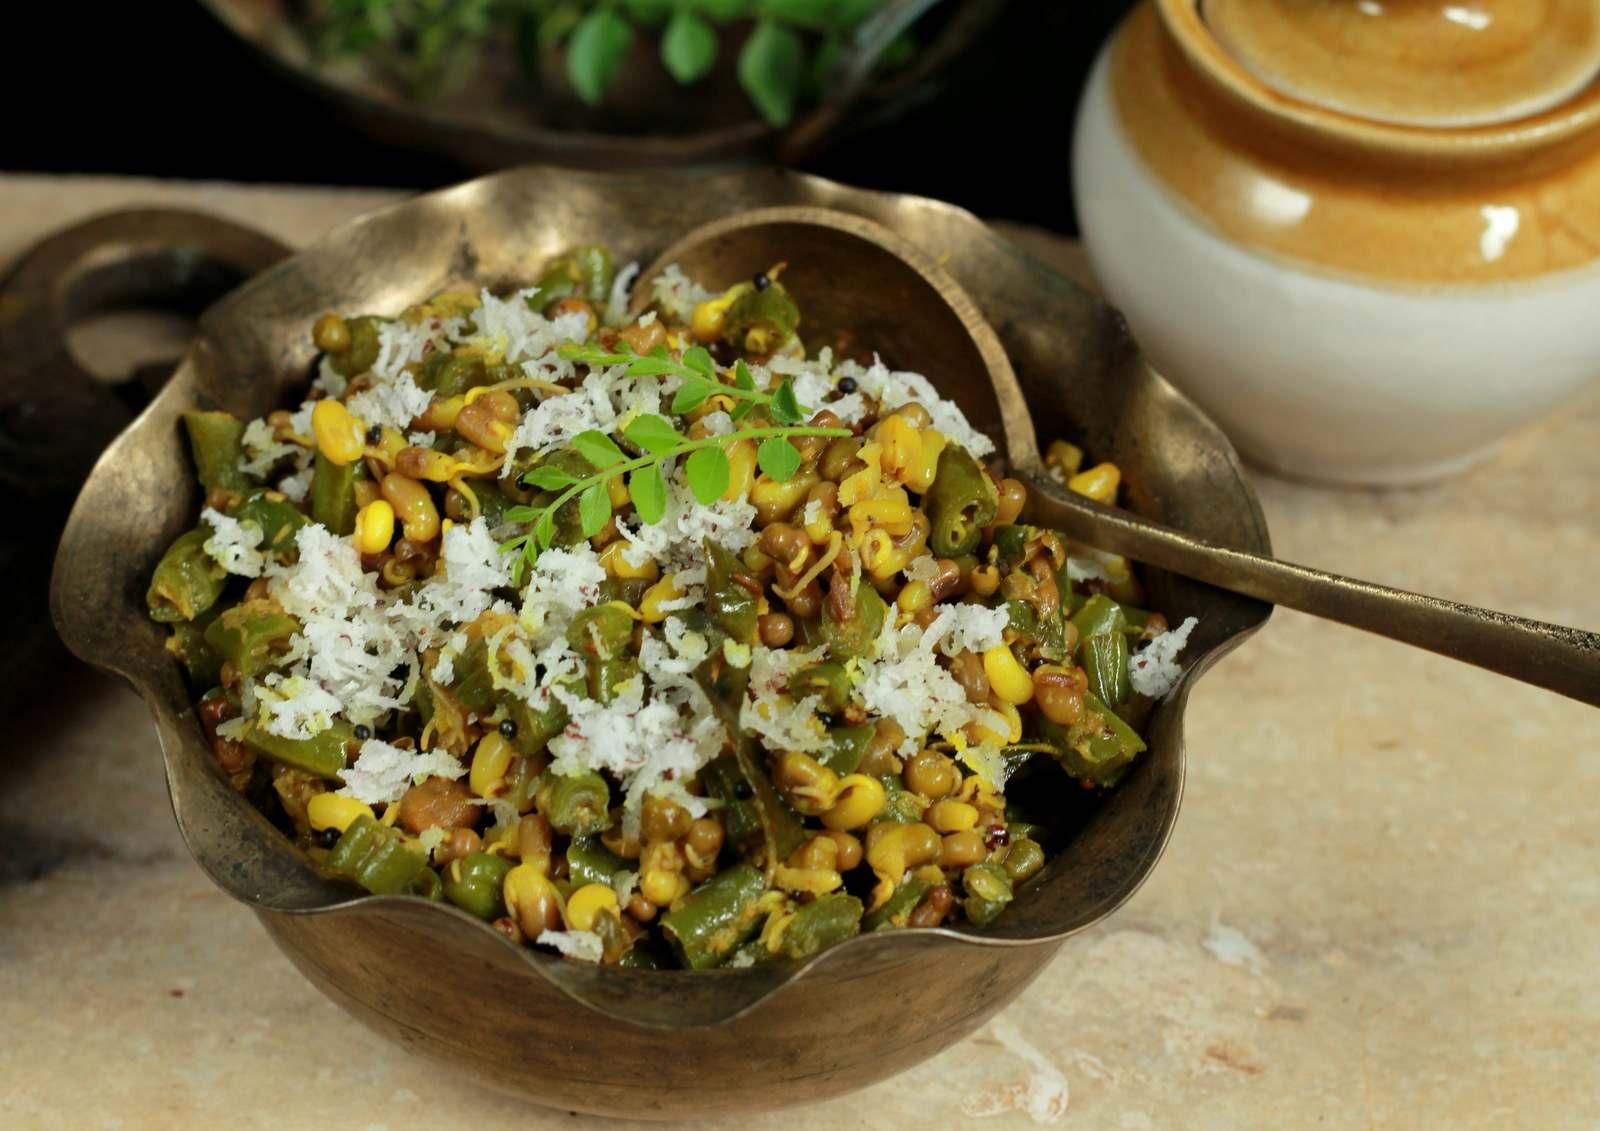 Beans and matki bhaji recipe maharashtrian green beans and beans and matki bhaji recipe maharashtrian green beans and sprouted moth beans forumfinder Images